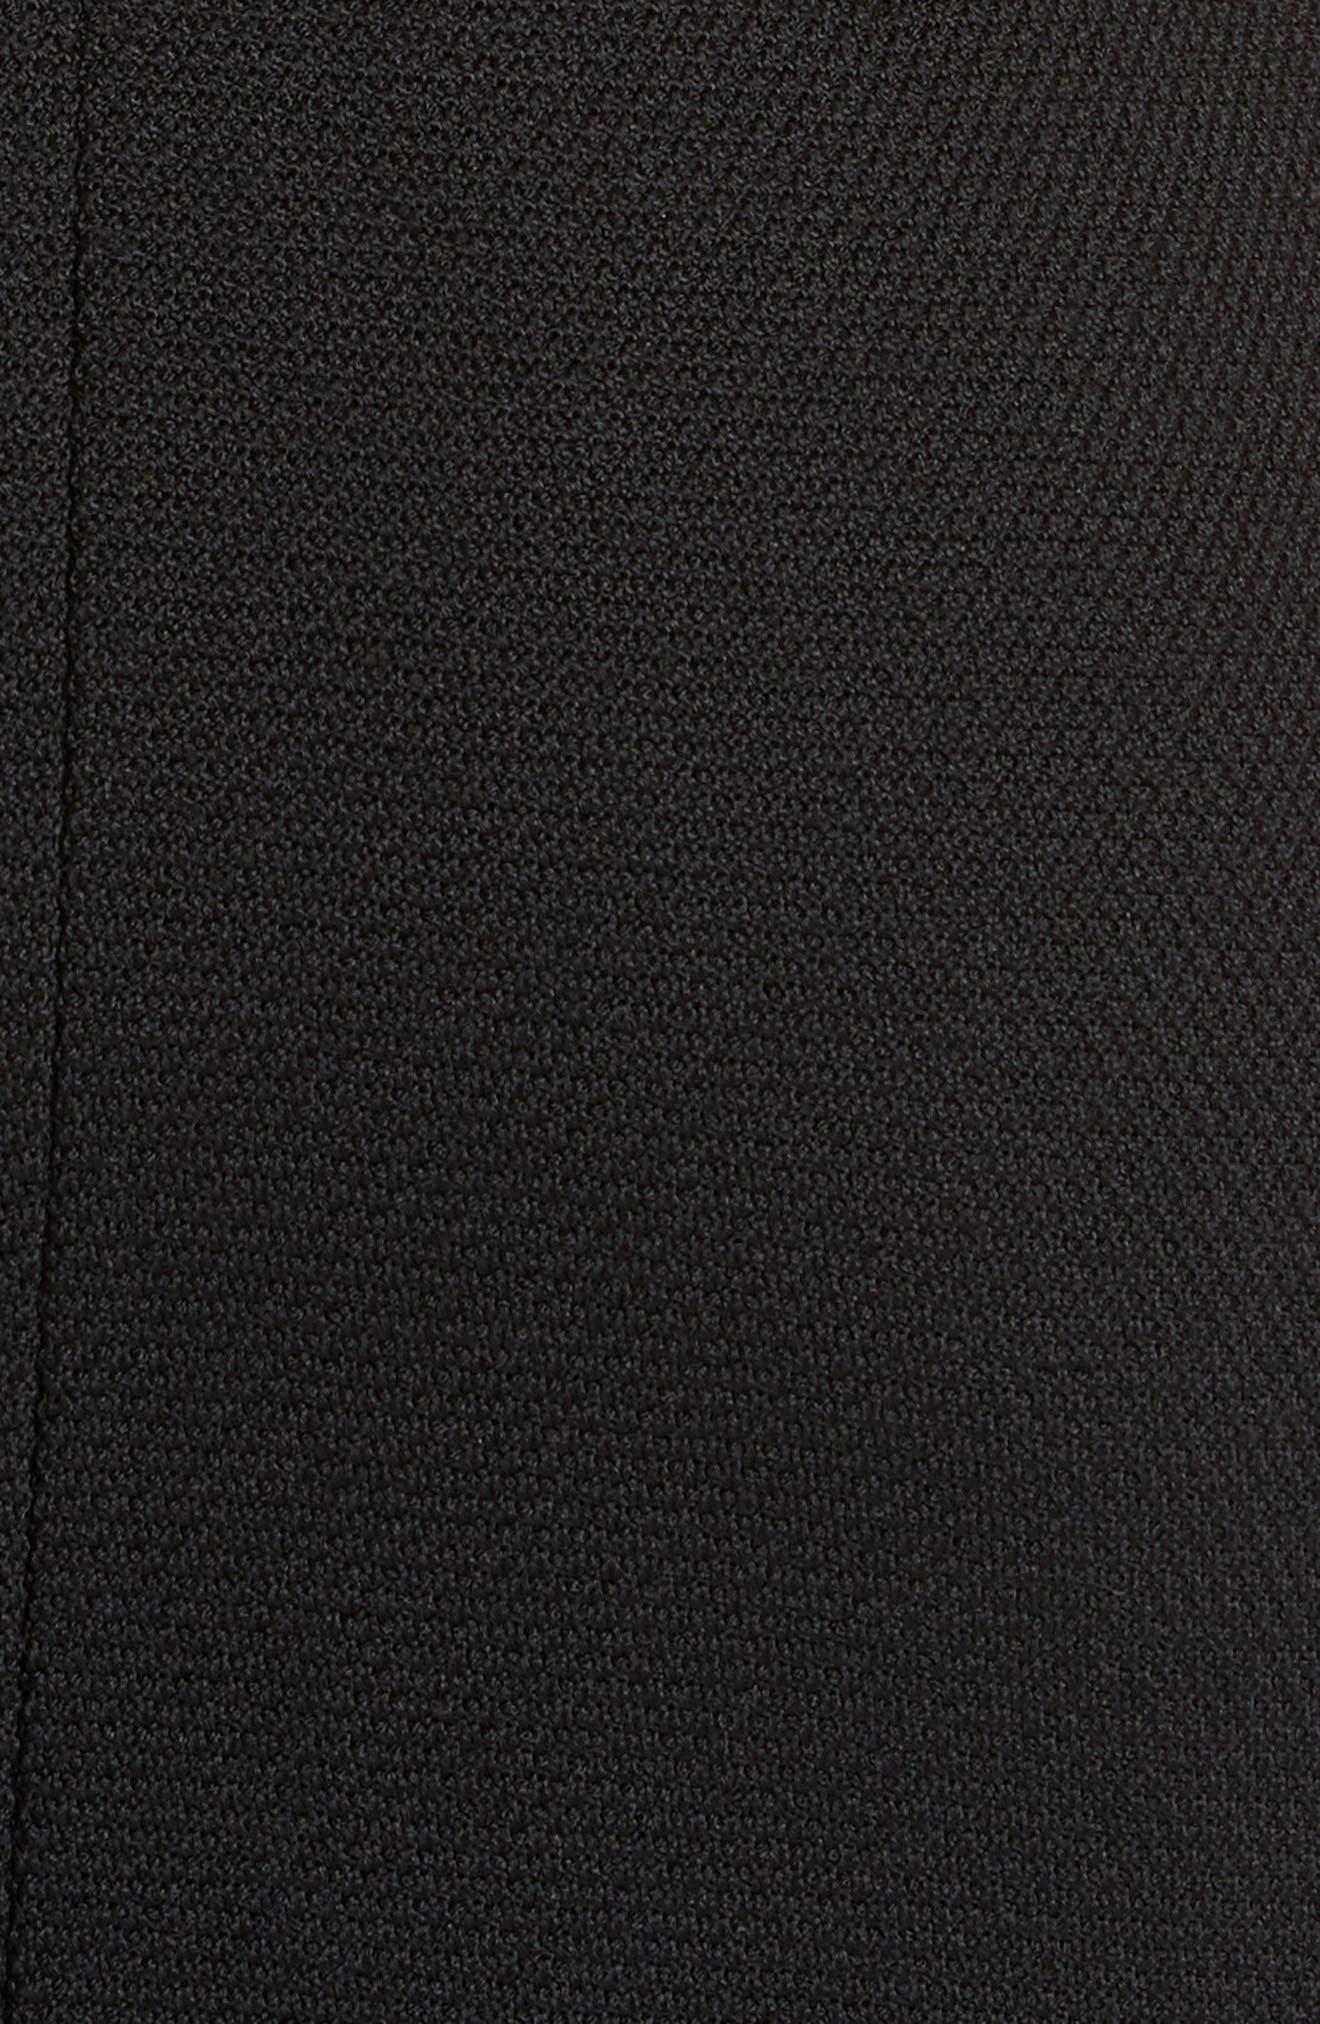 Alternate Image 3  - St. John Collection Micro Bouclé Knit Dress